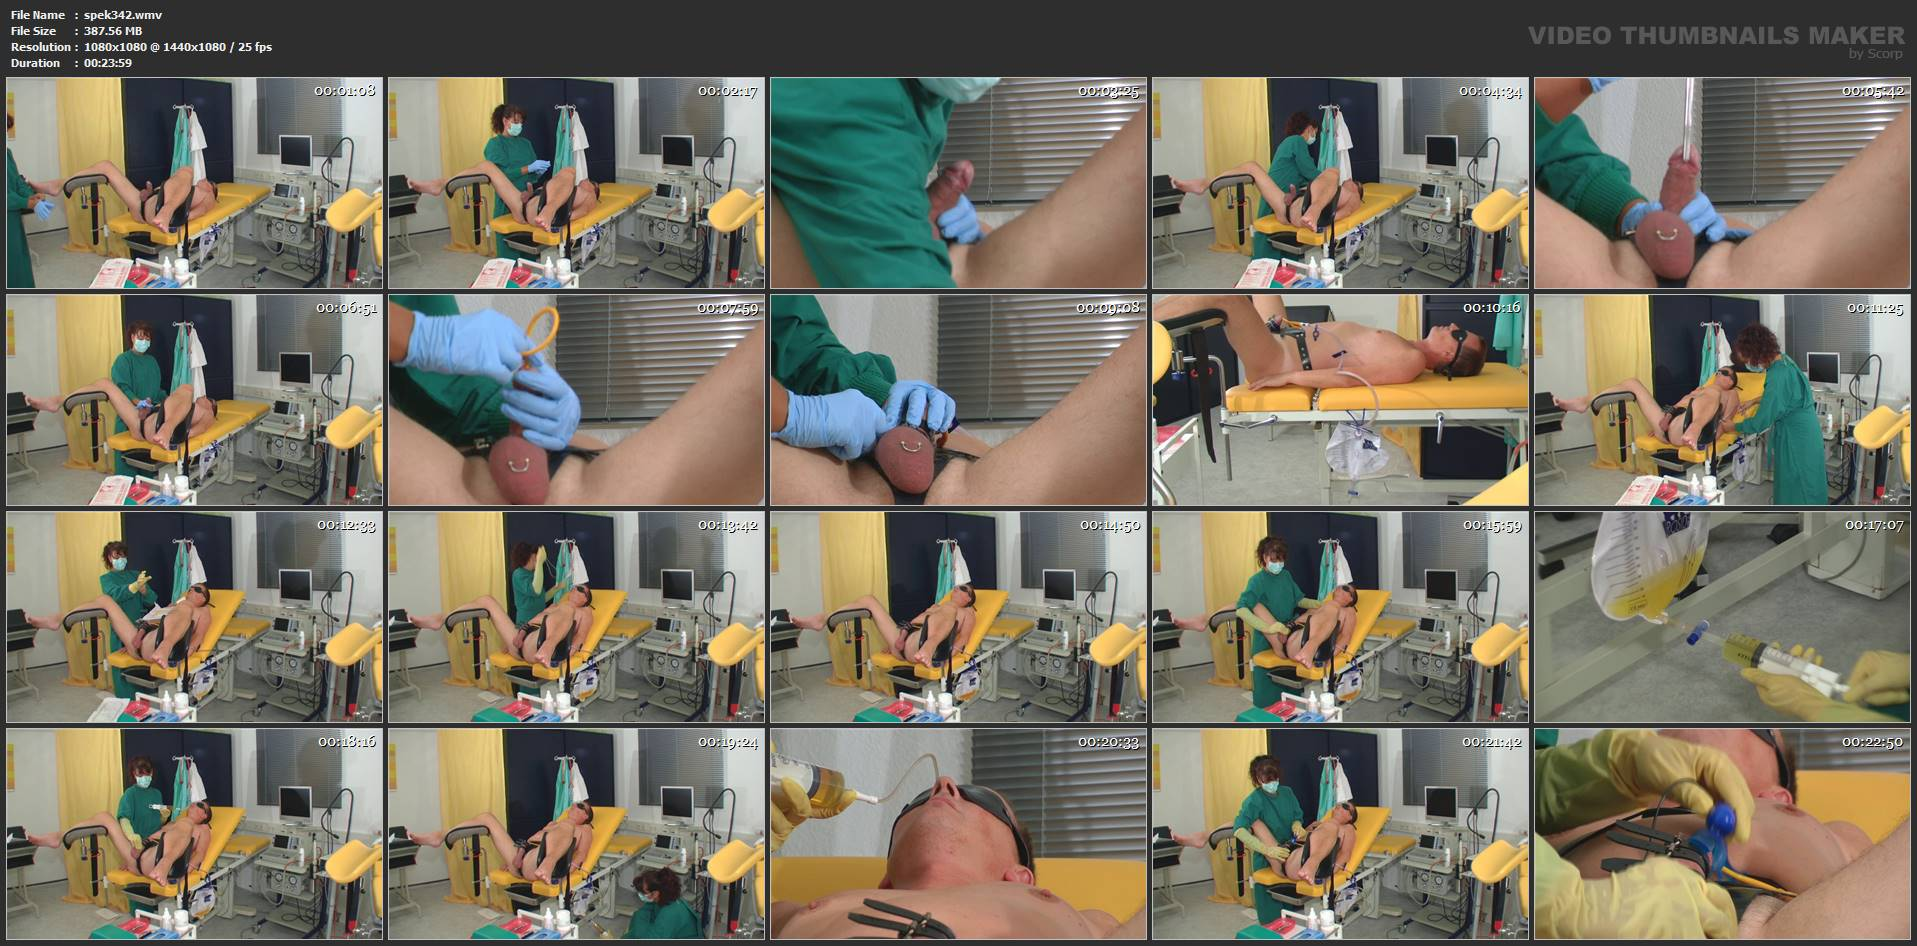 [SPEKULA] Catheter stomachsound [FULL HD][1080p][WMV]